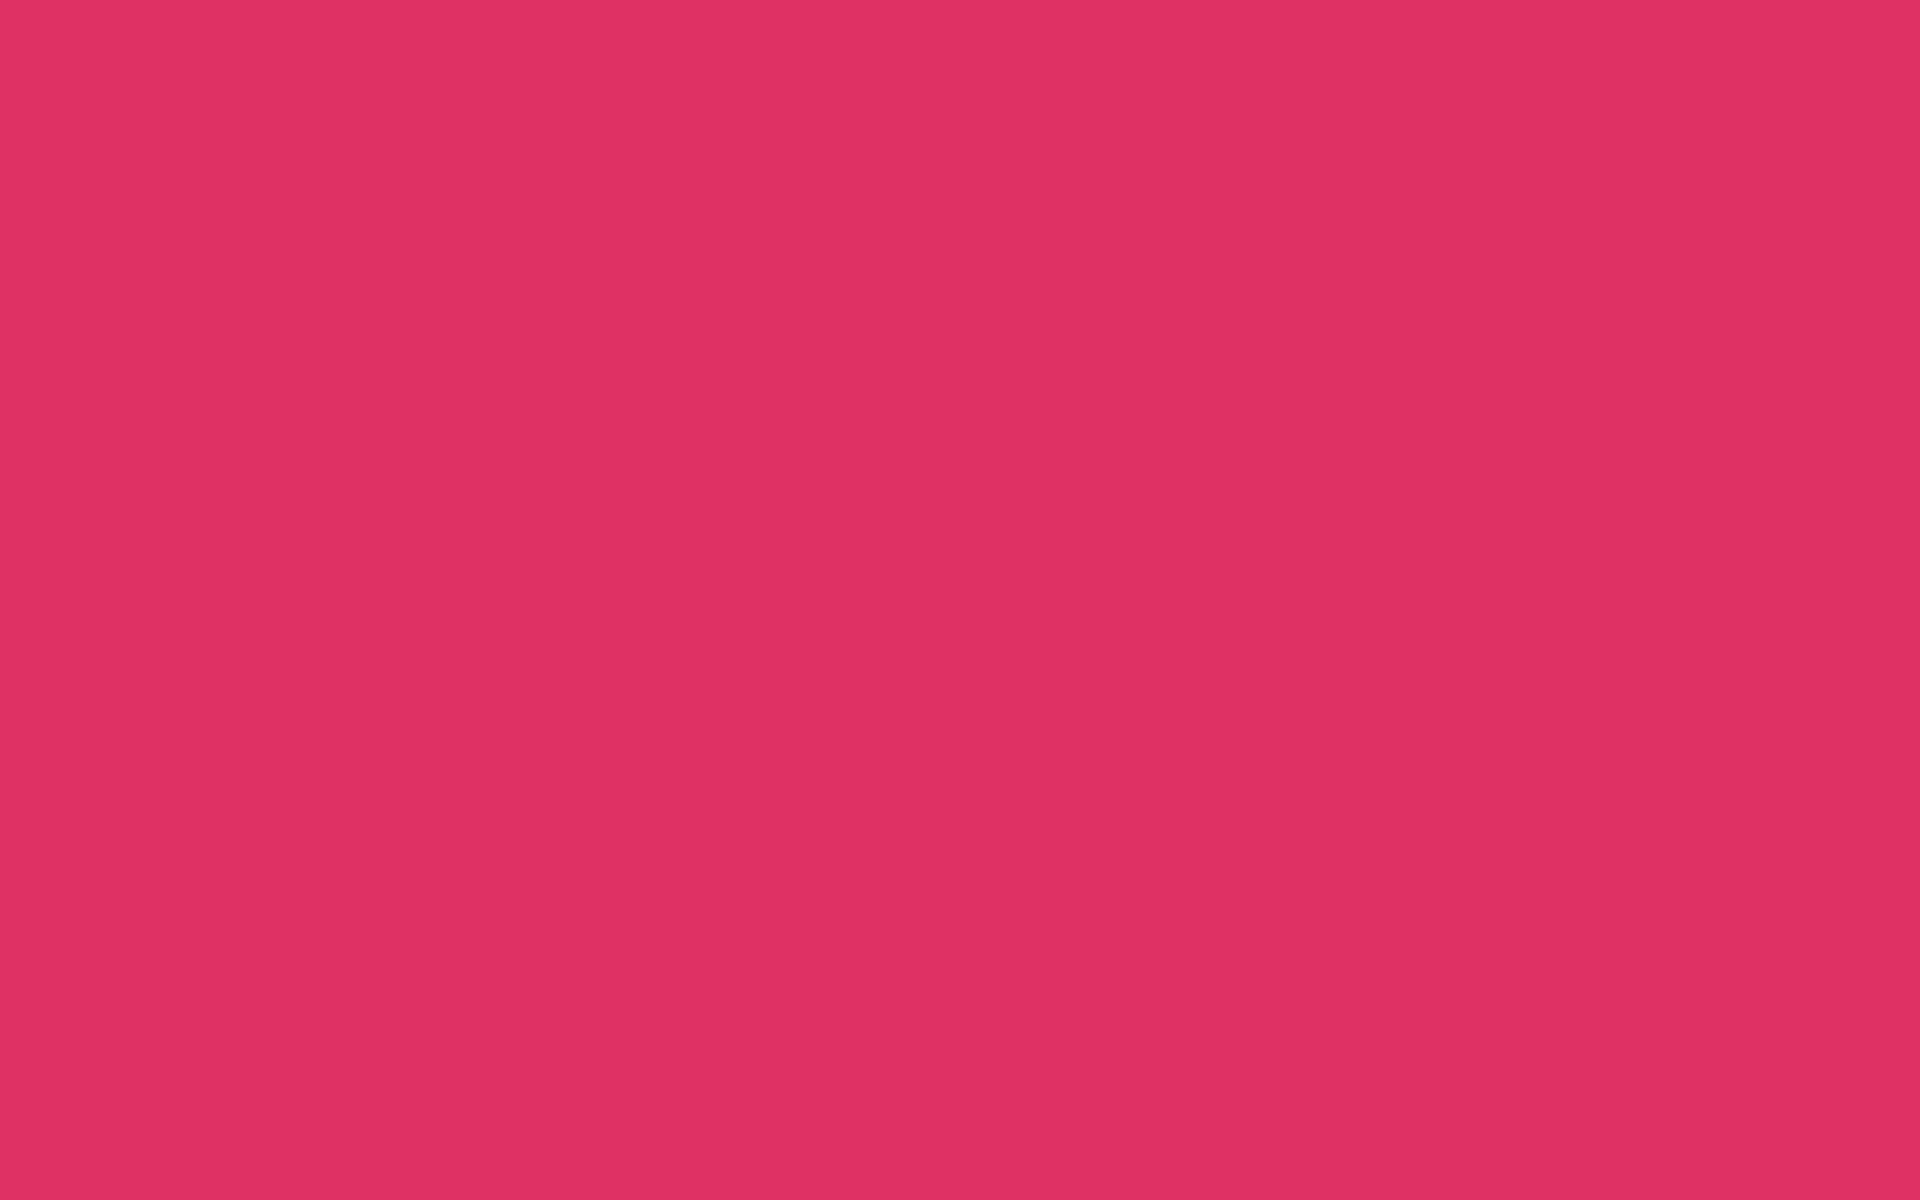 cerise color - 28 images - cerise solid color background ...